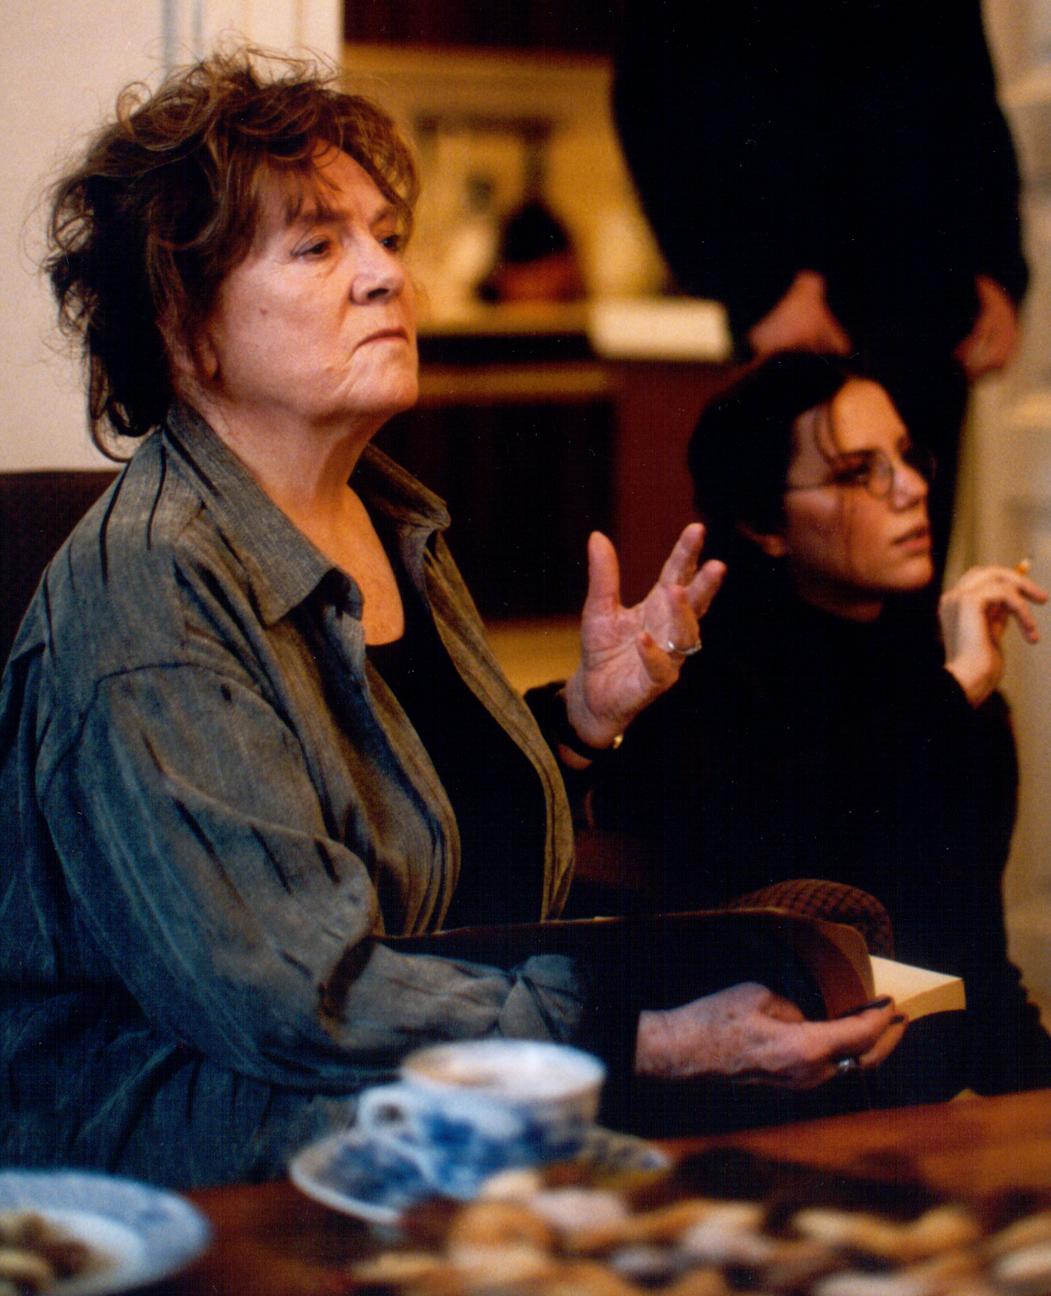 Joan Van Ark born June 16, 1943 (age 75) XXX fotos Jade Ecleo (b. 1970),Rhys Matthew Bond (born 1998)